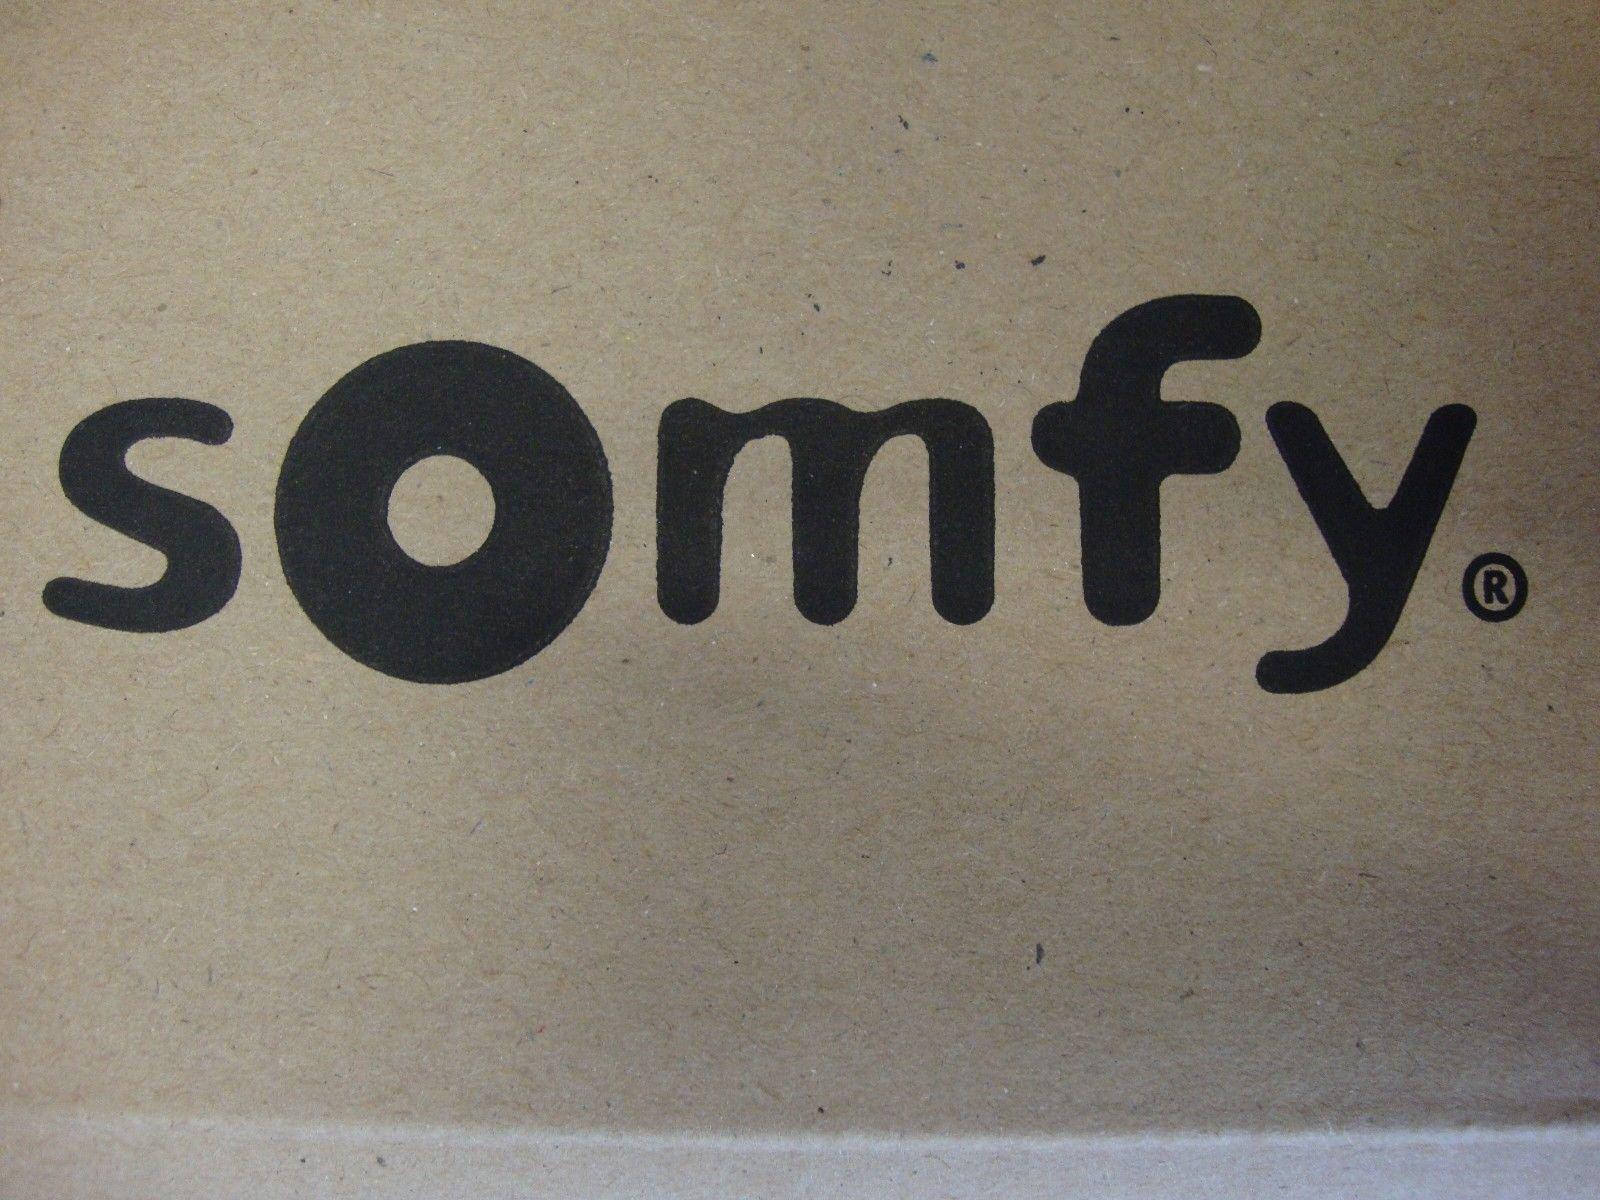 1QTY: Somfy GLYDEA 35 RTS US 10' PLUG (# 1001615) for Somfy motorized Drapery